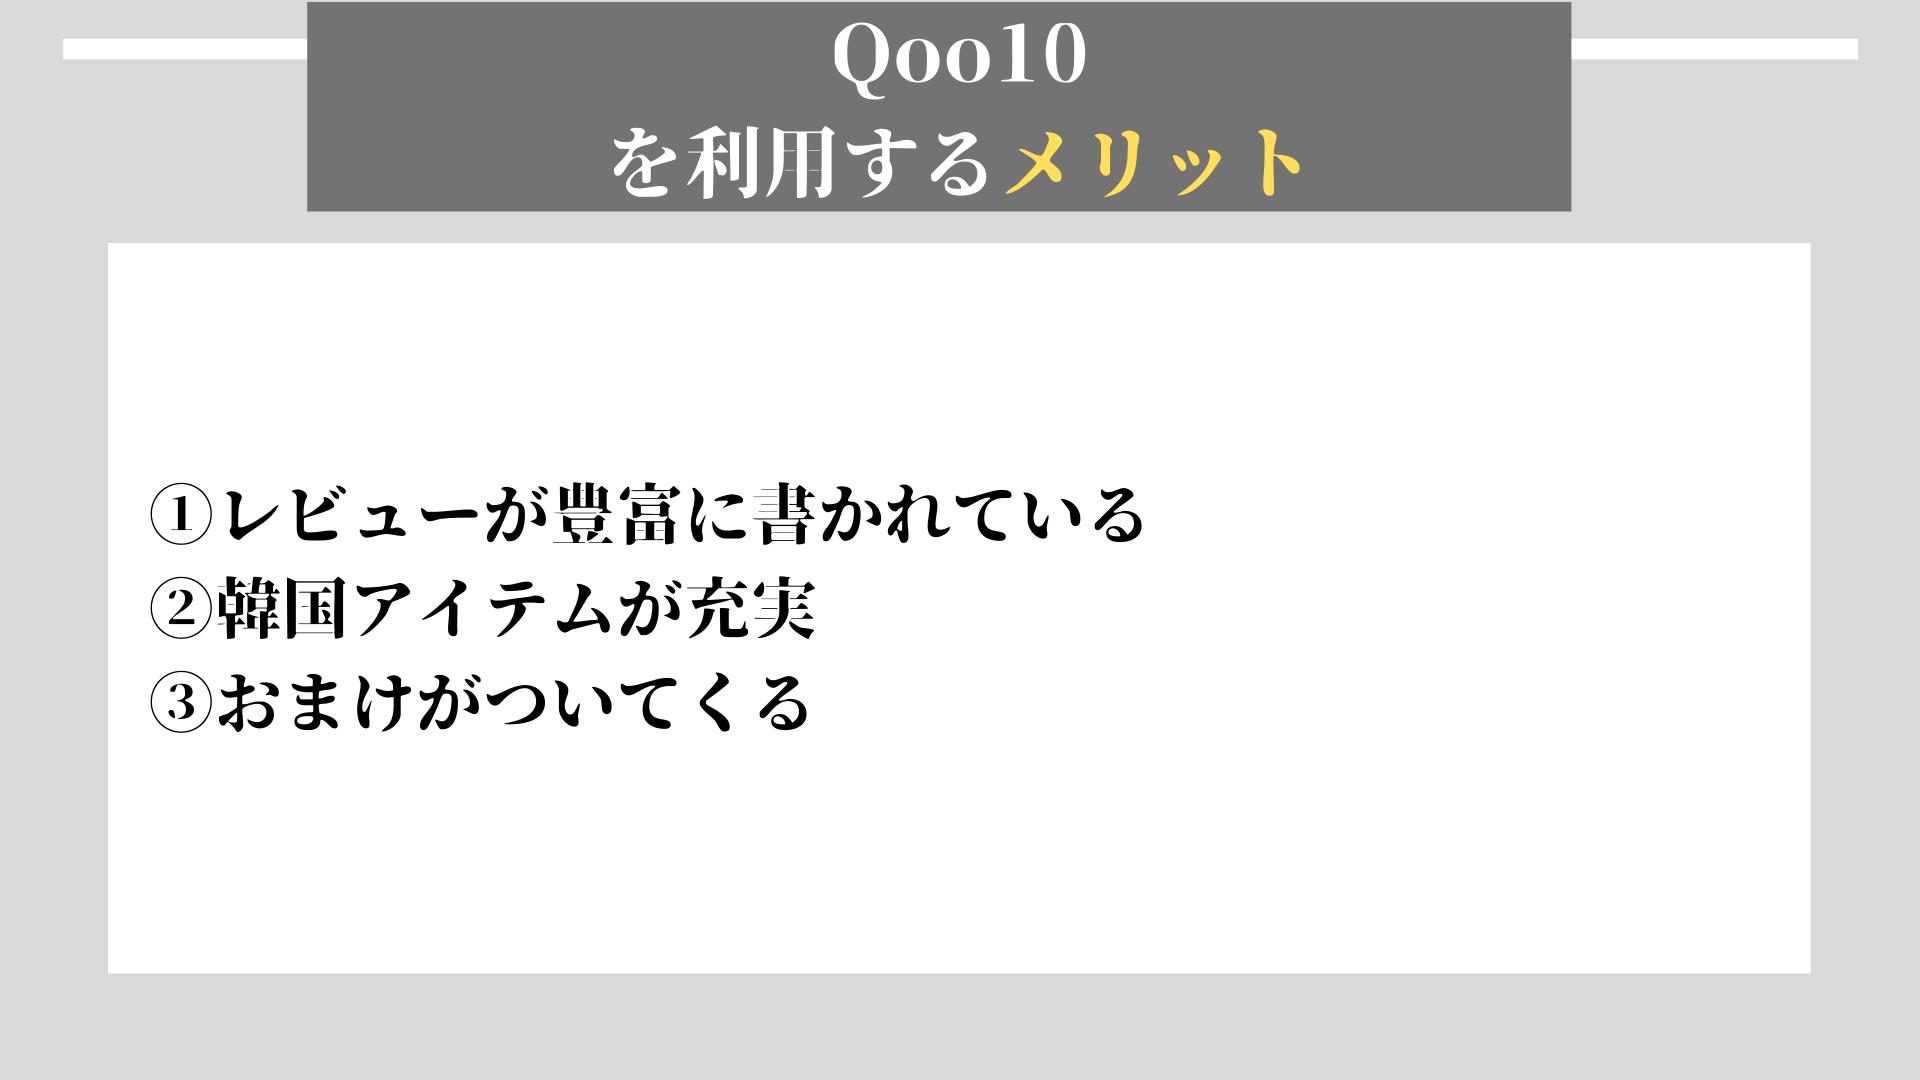 Qoo10 メリット